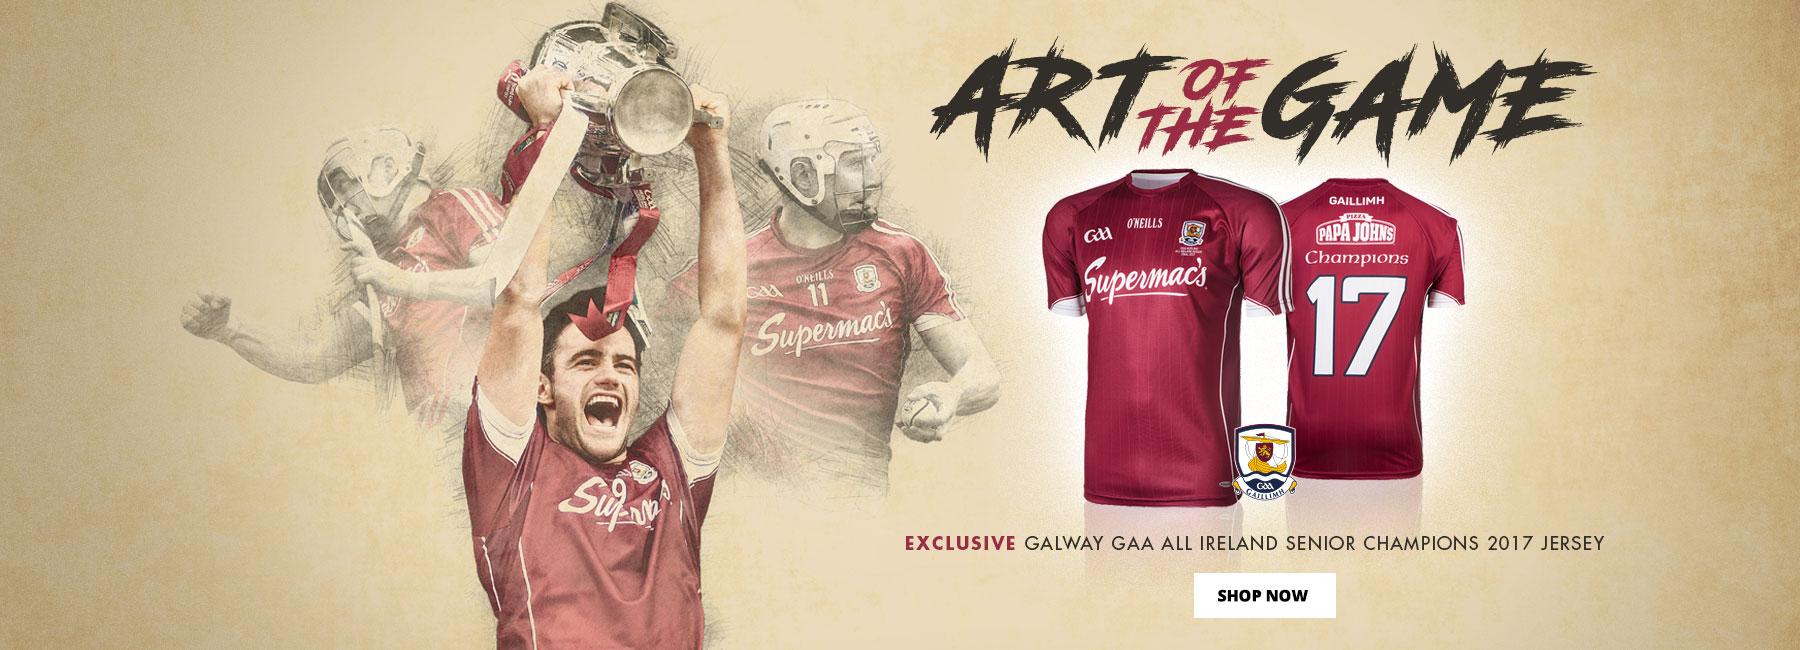 Galway GAA Champions